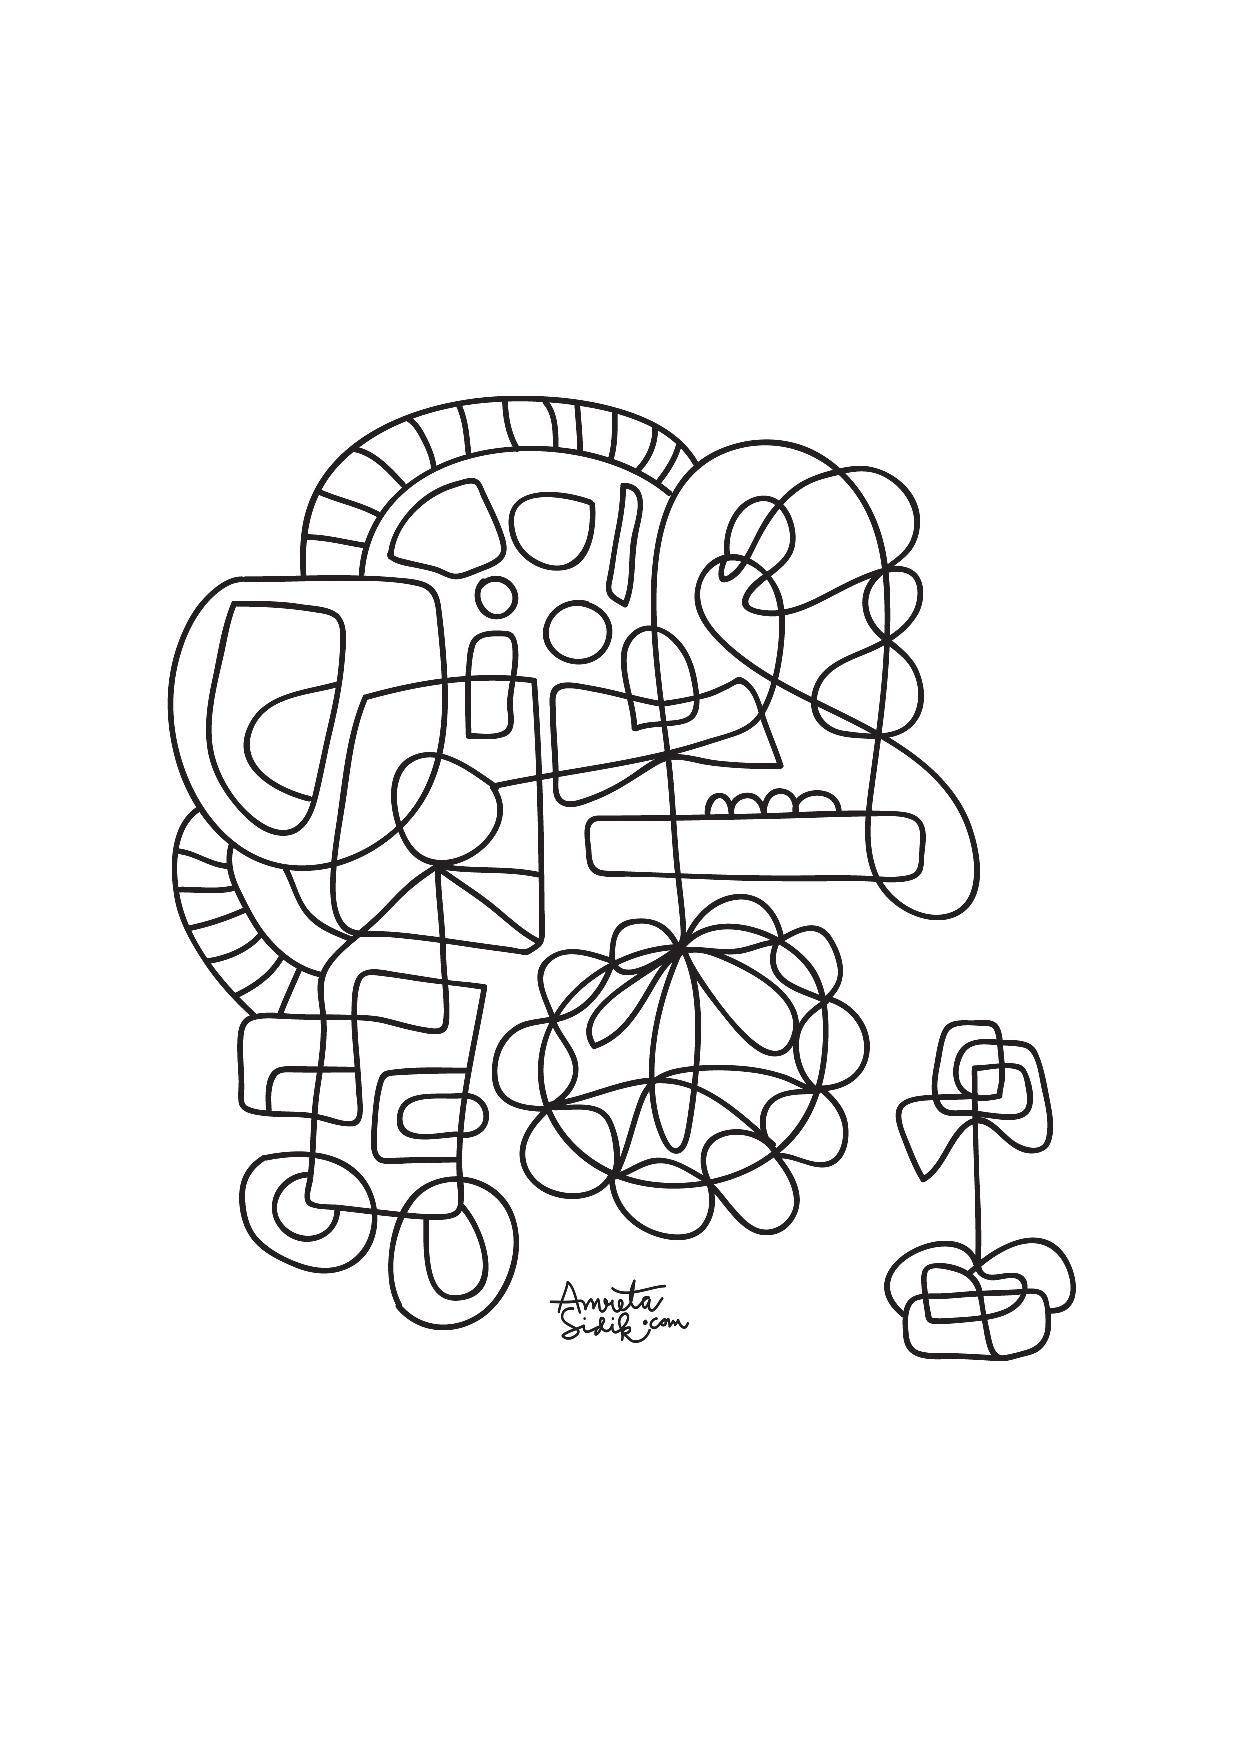 AbstraitA partir de la galerie : Anti StressArtiste : Amreta Sidik